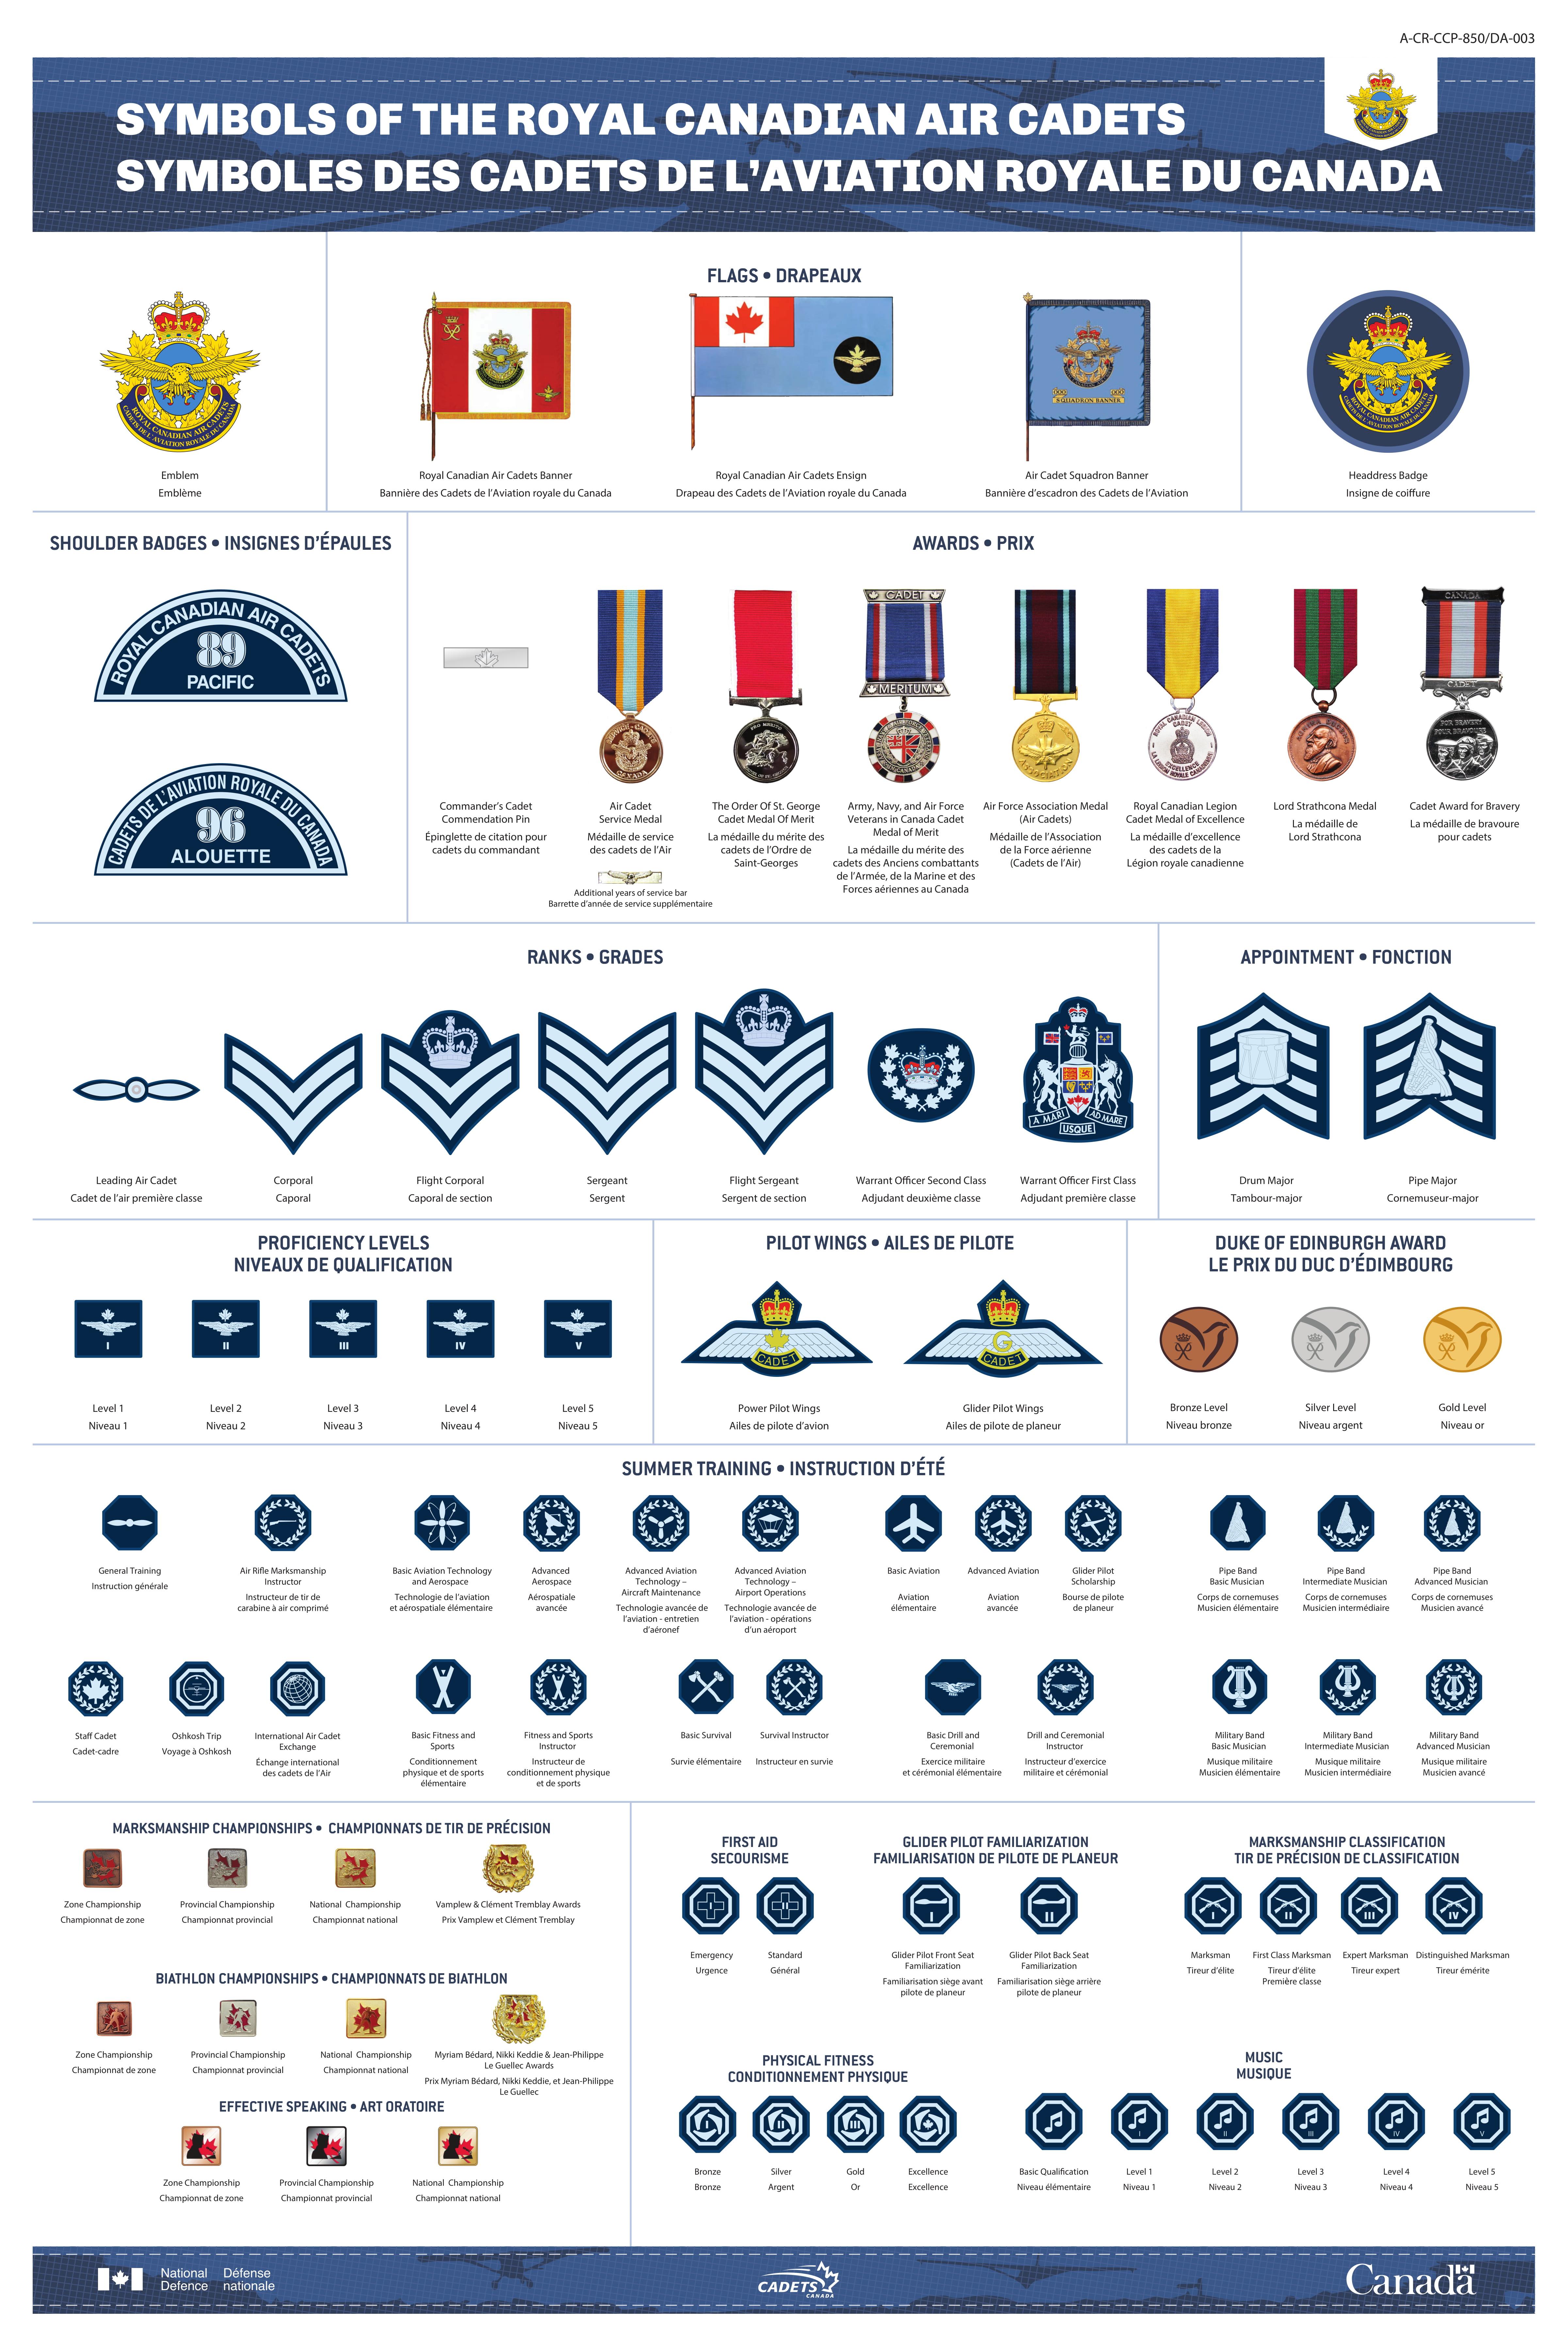 Symbols of The Royal Canadian Air Cadets